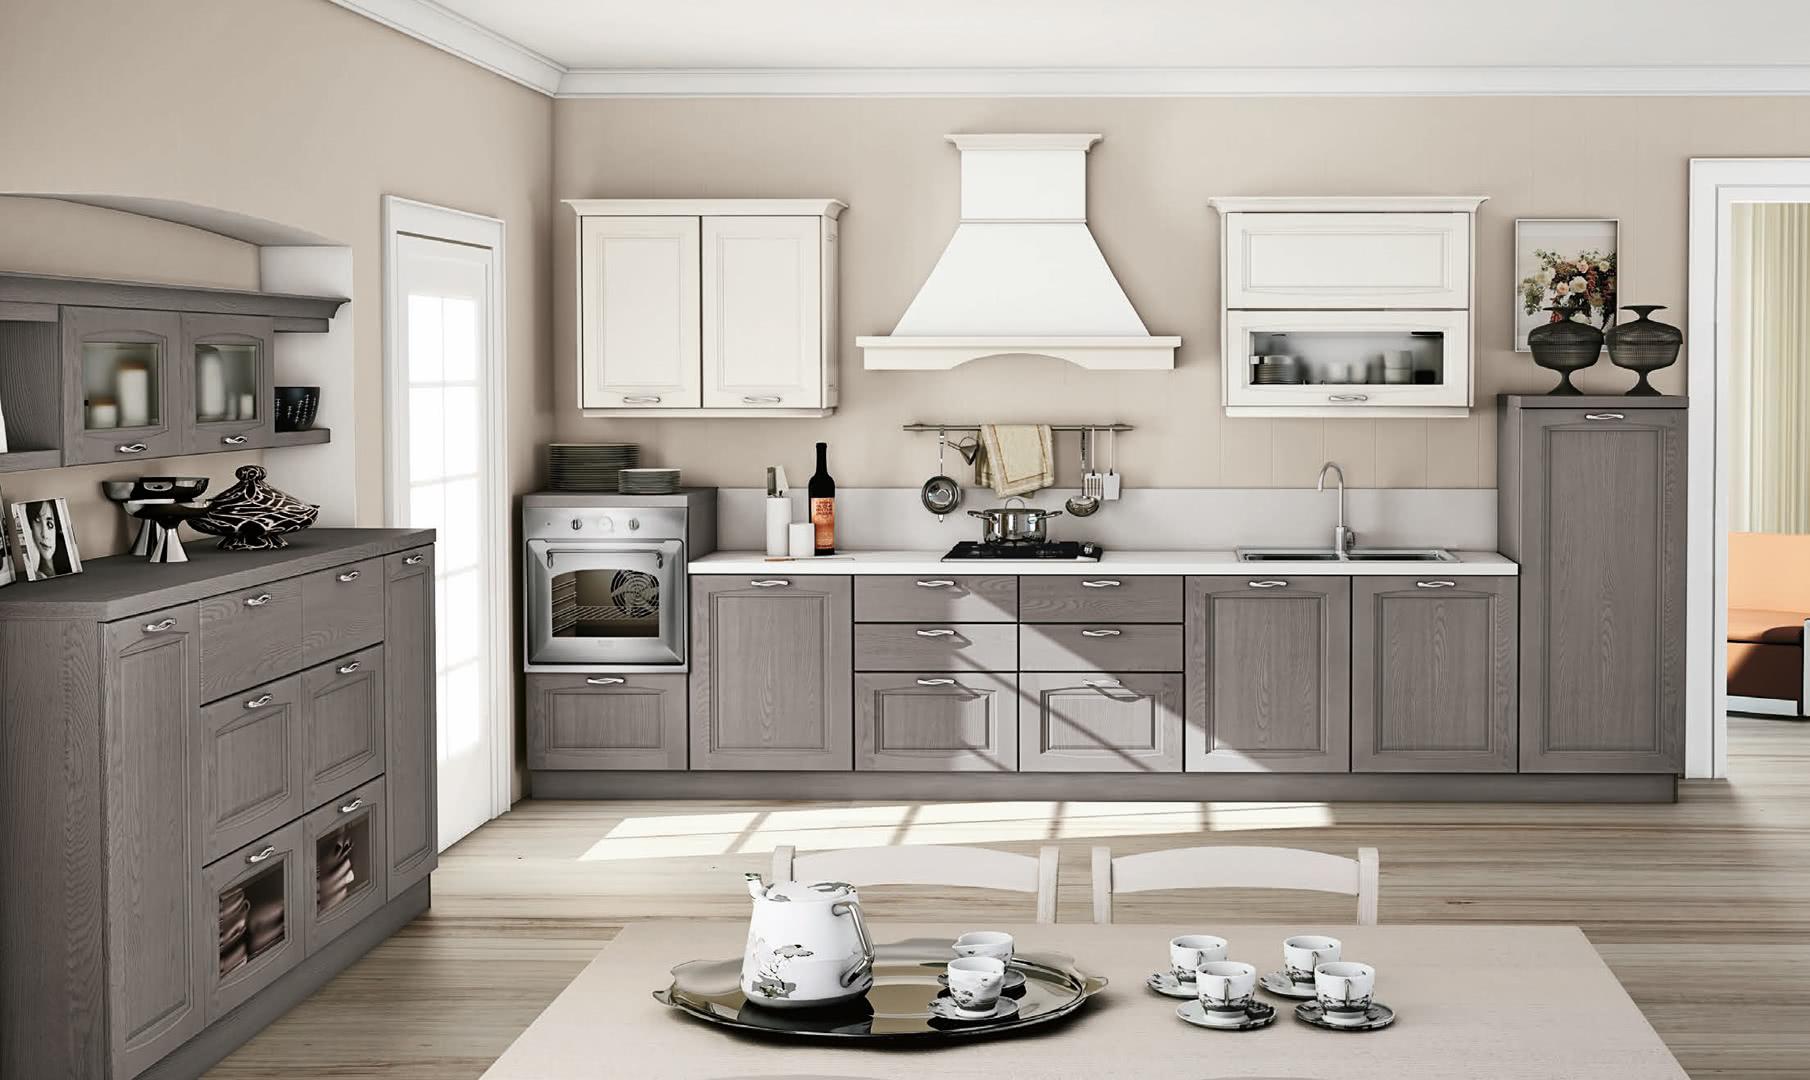 Cucina Raila - Cucine Componibili - Creo Kitchens